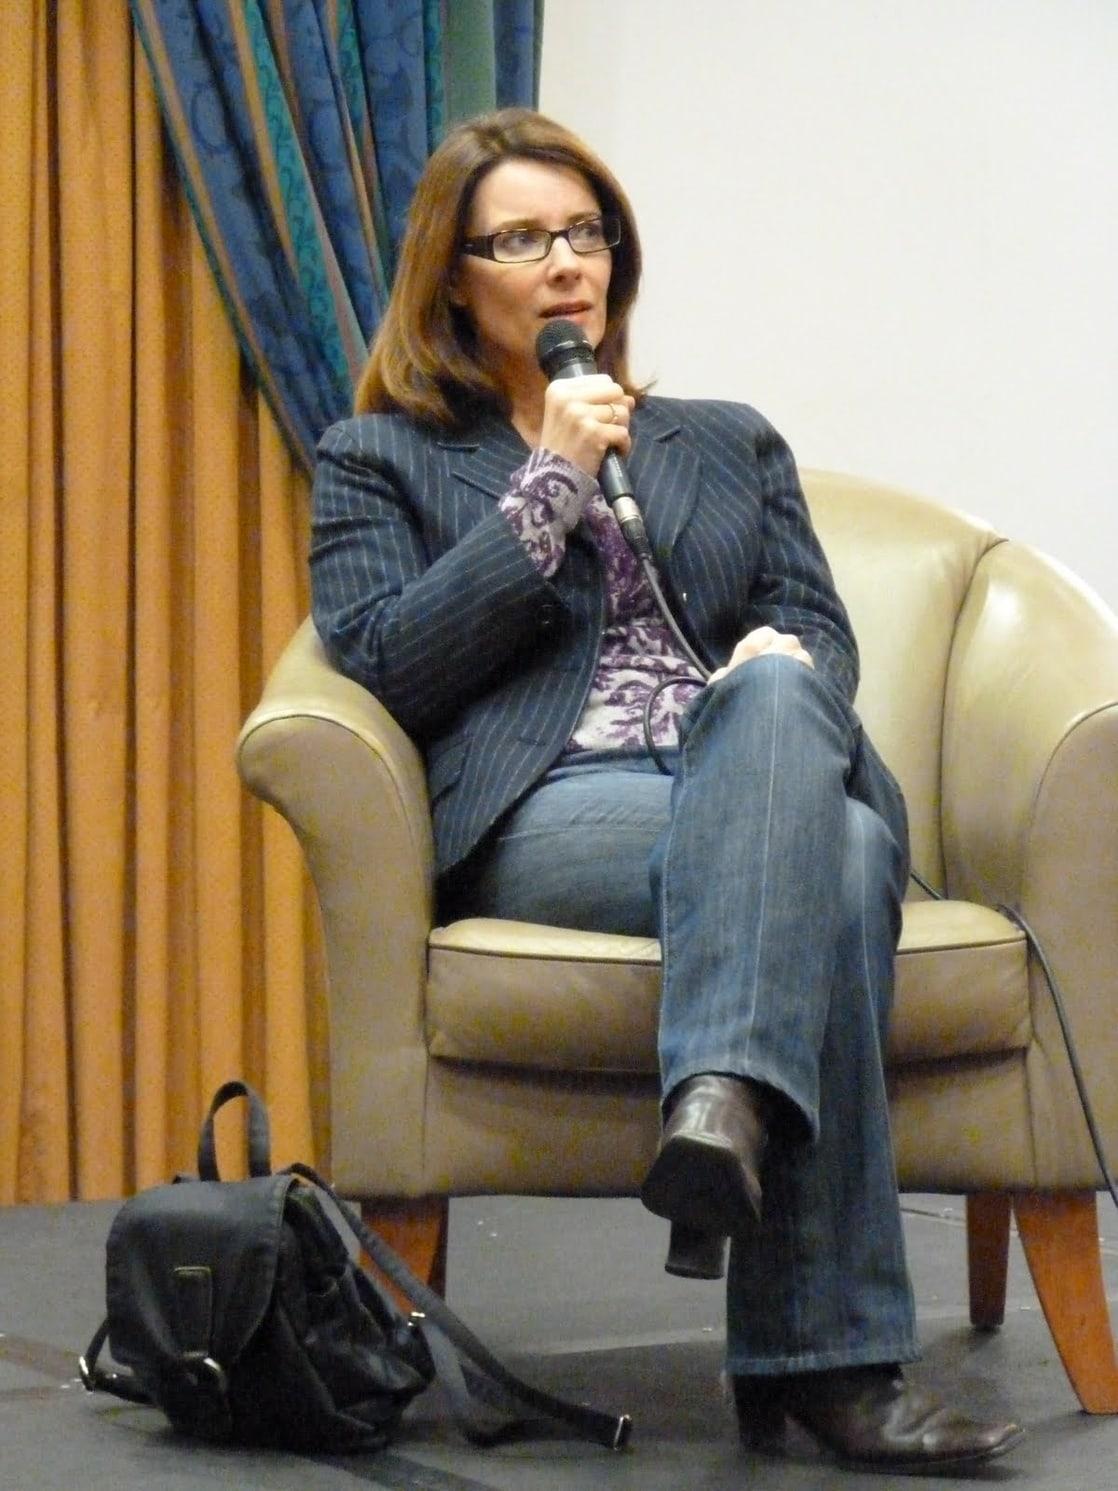 Discussion on this topic: Jenn Colella, nicola-bryant/